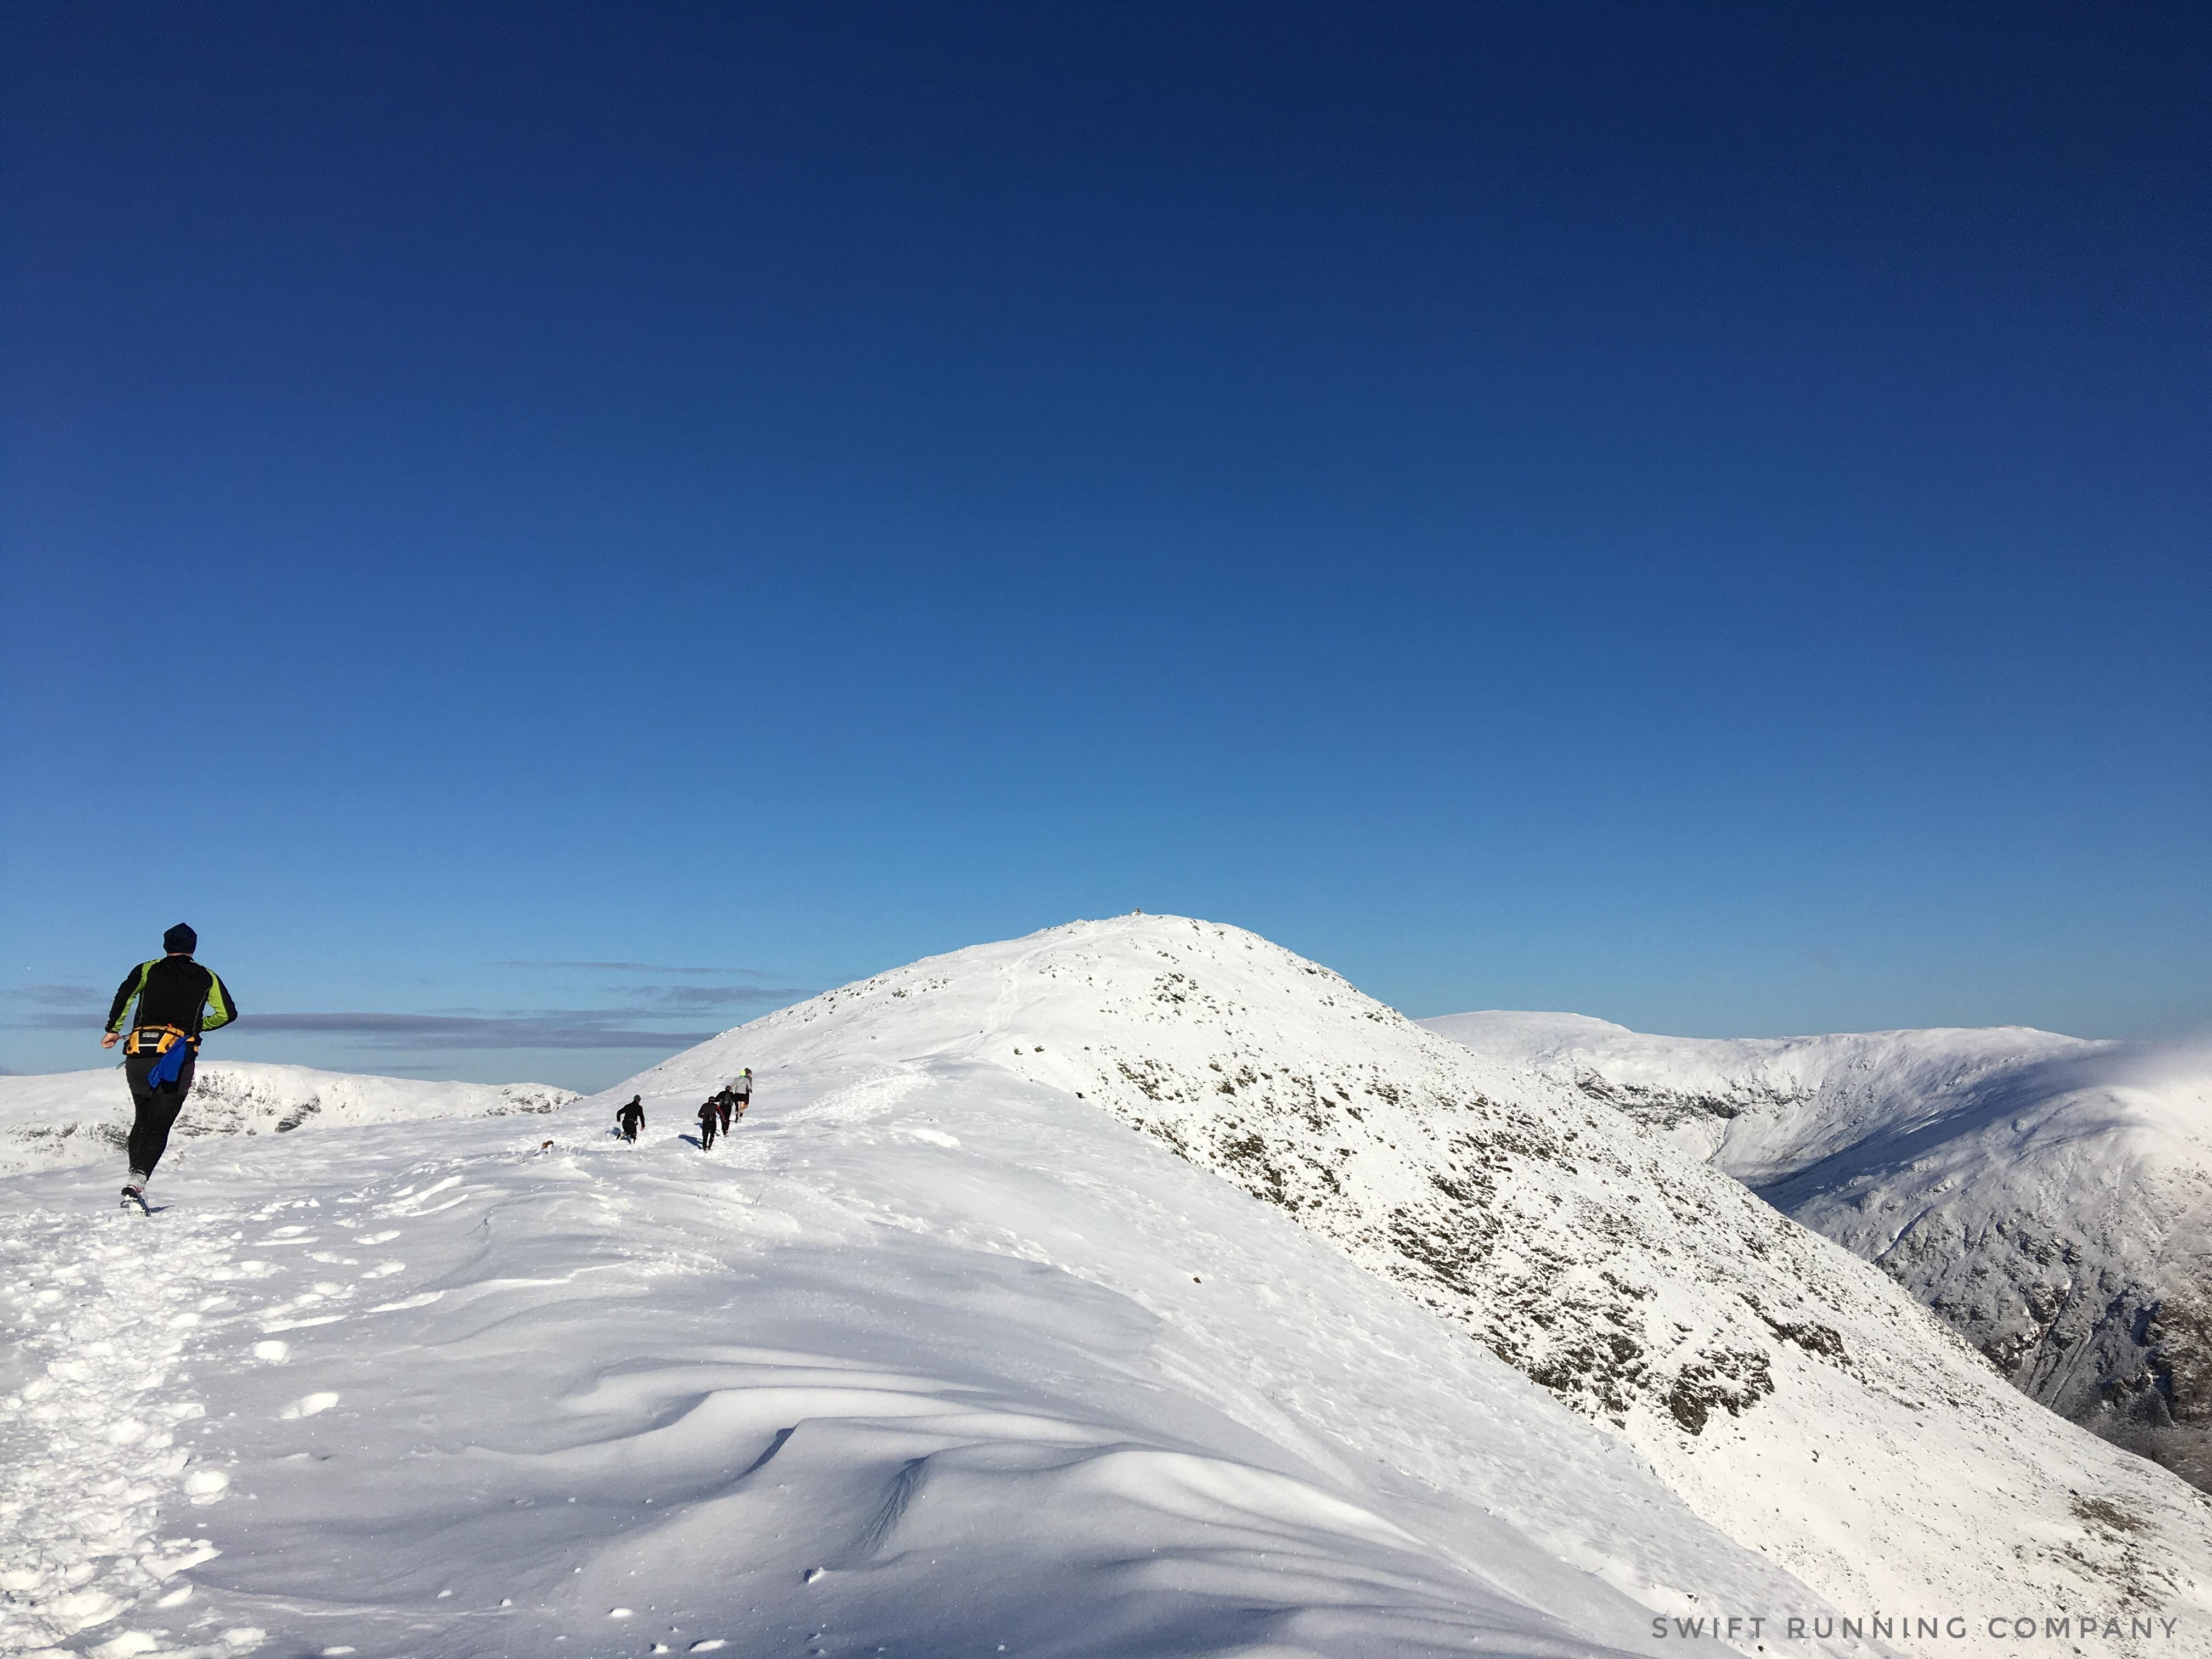 Winter running on ridge lines